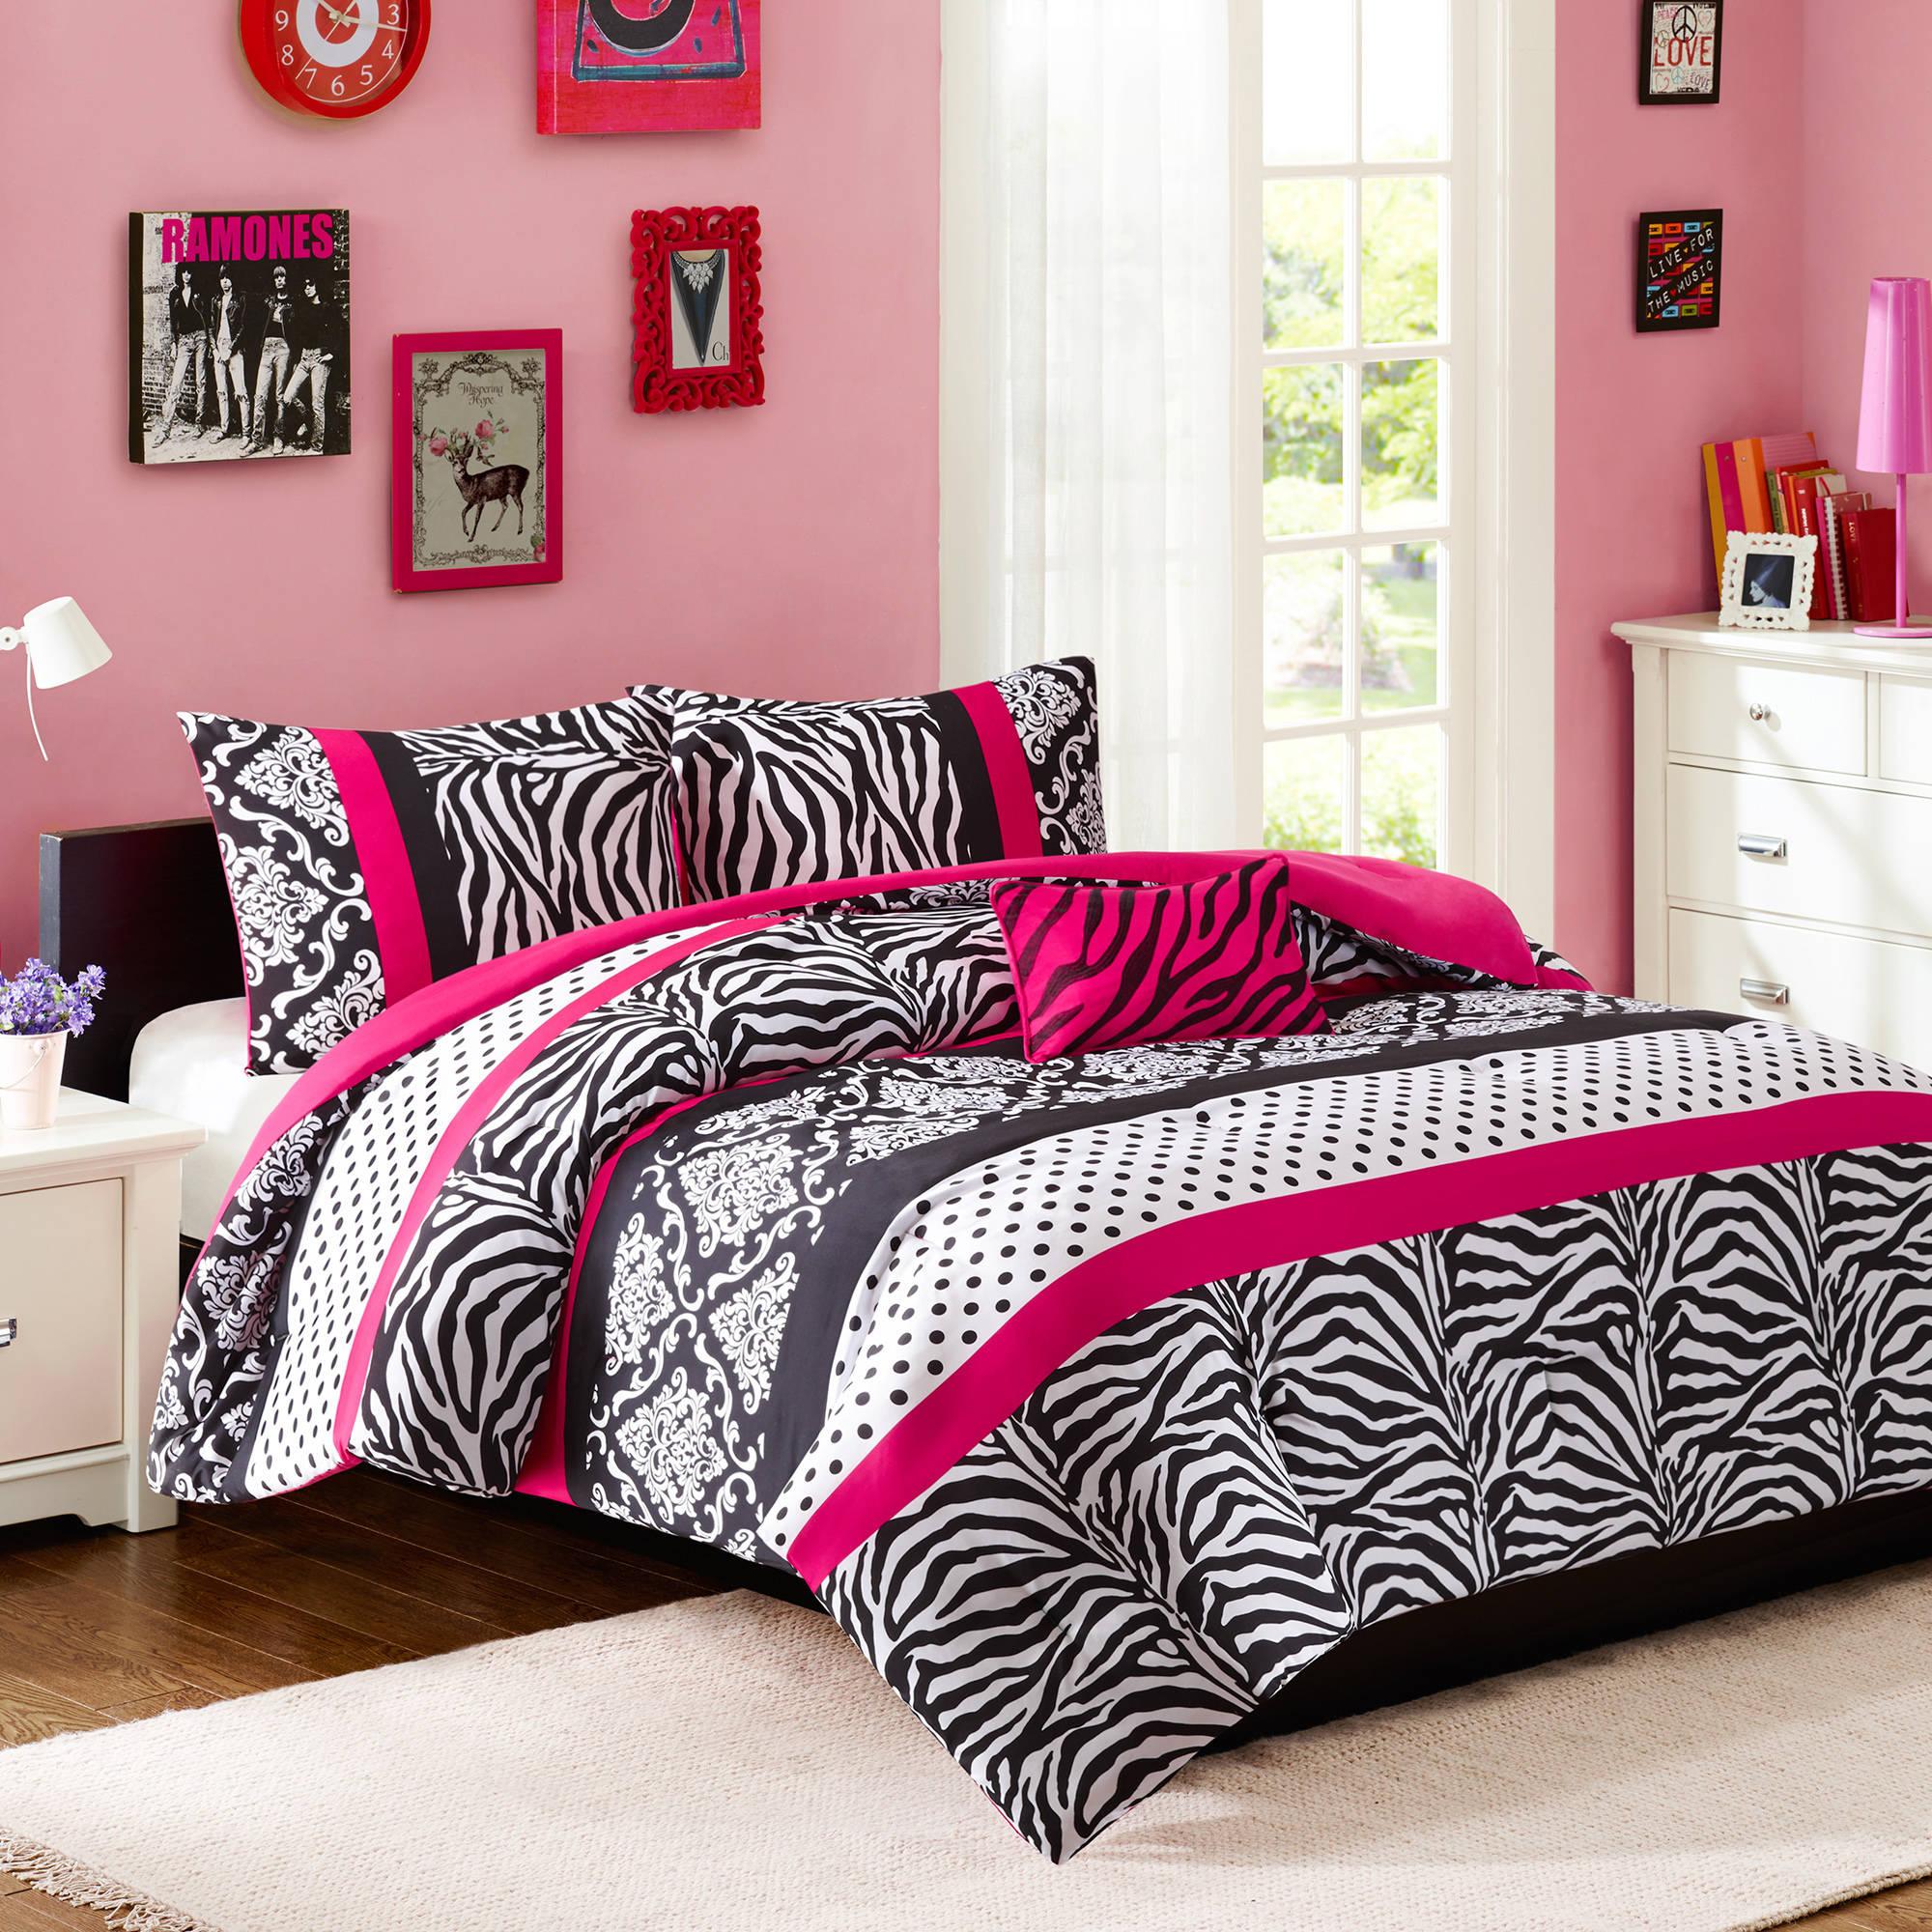 Home Essence Apartment Leona Bedding Comforter Set